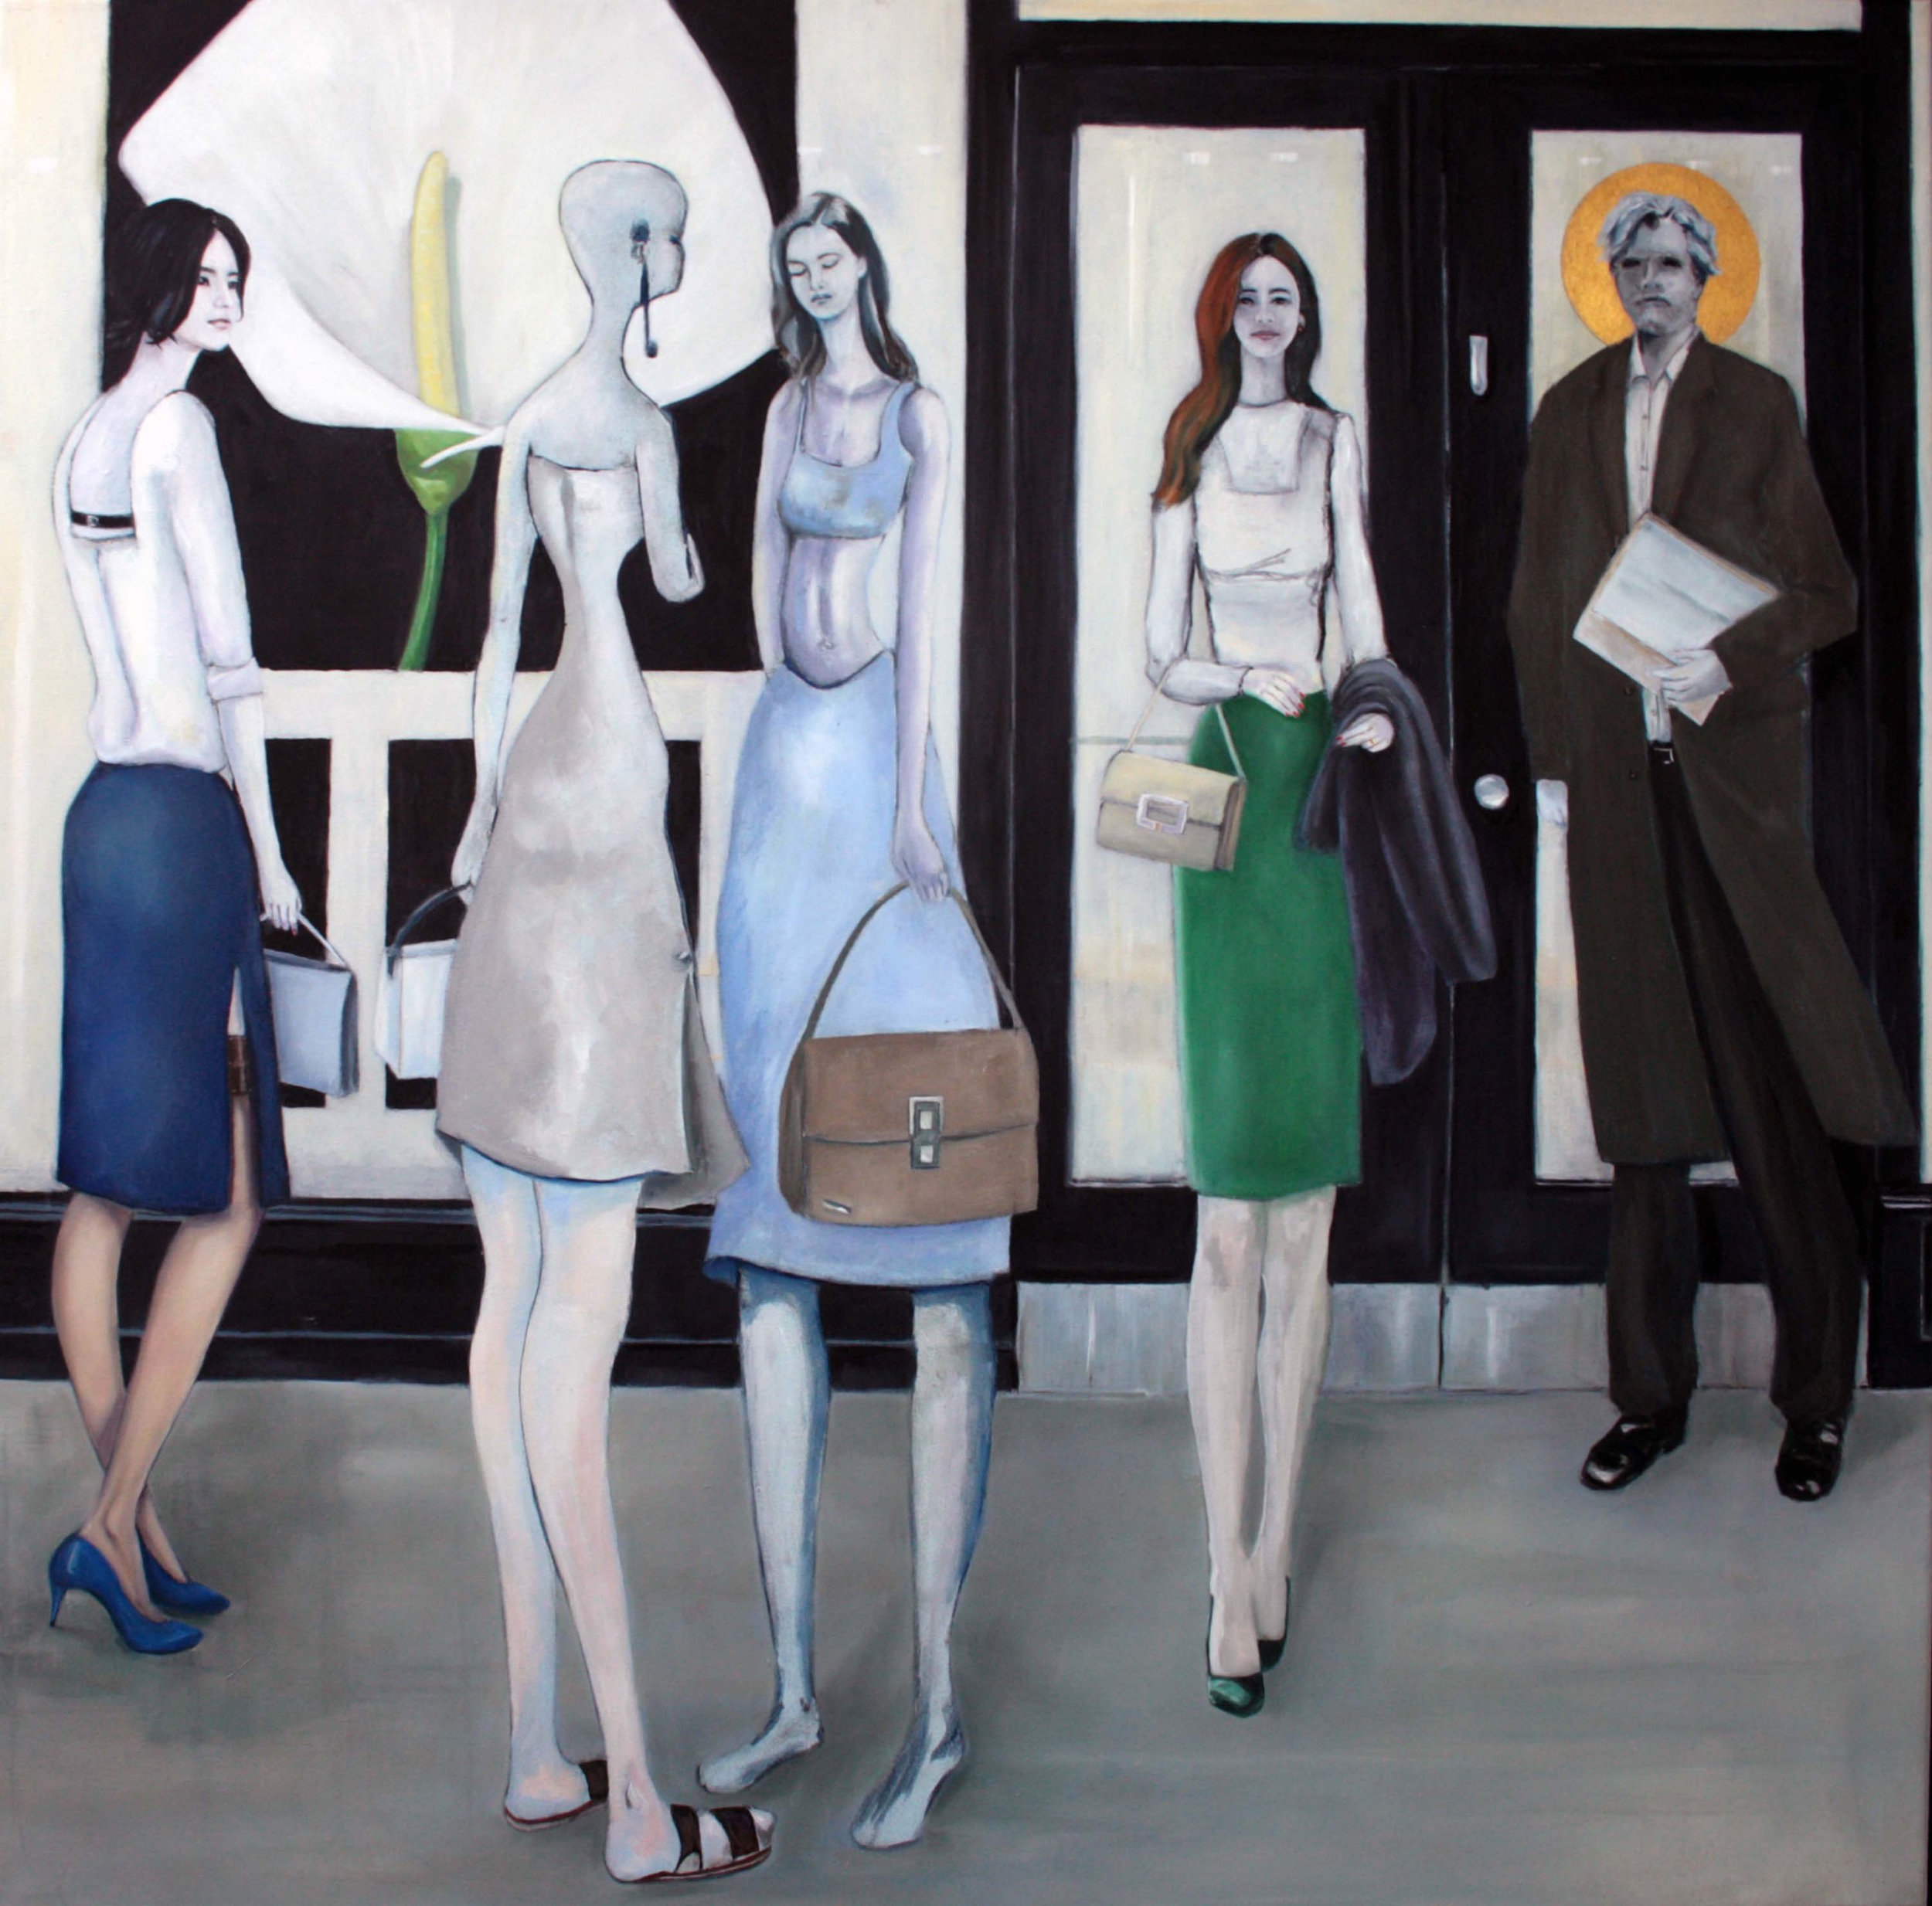 ALAN CARLYON SMITH - STUDIO 247